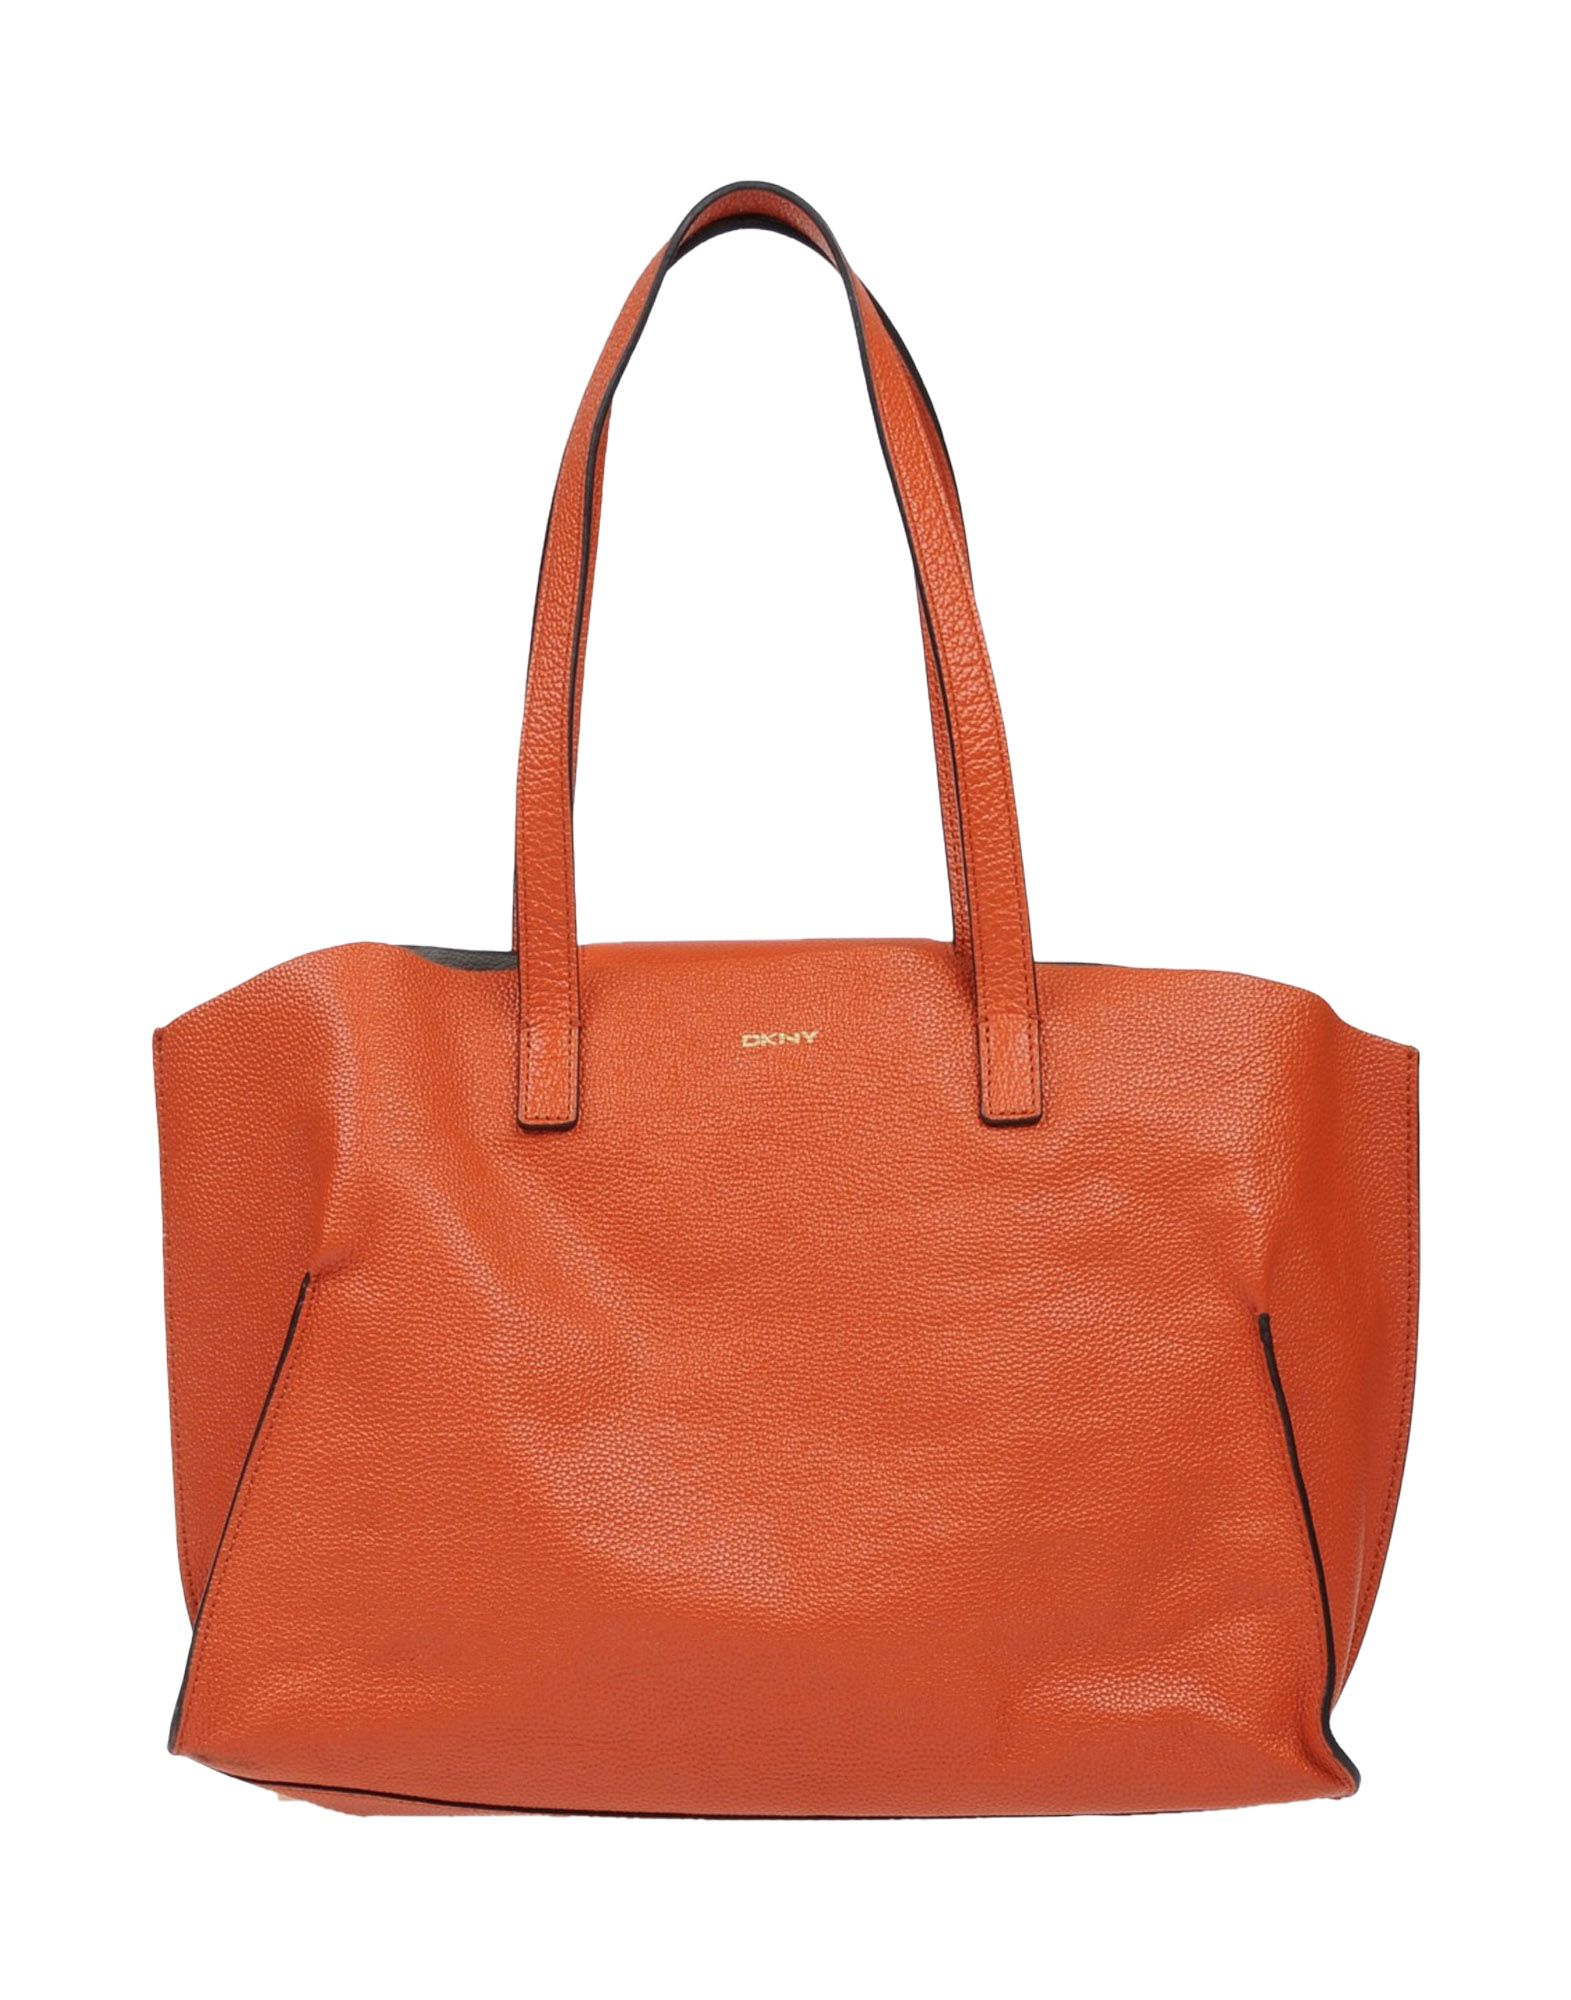 DKNY レディース ハンドバッグ オレンジ 牛革